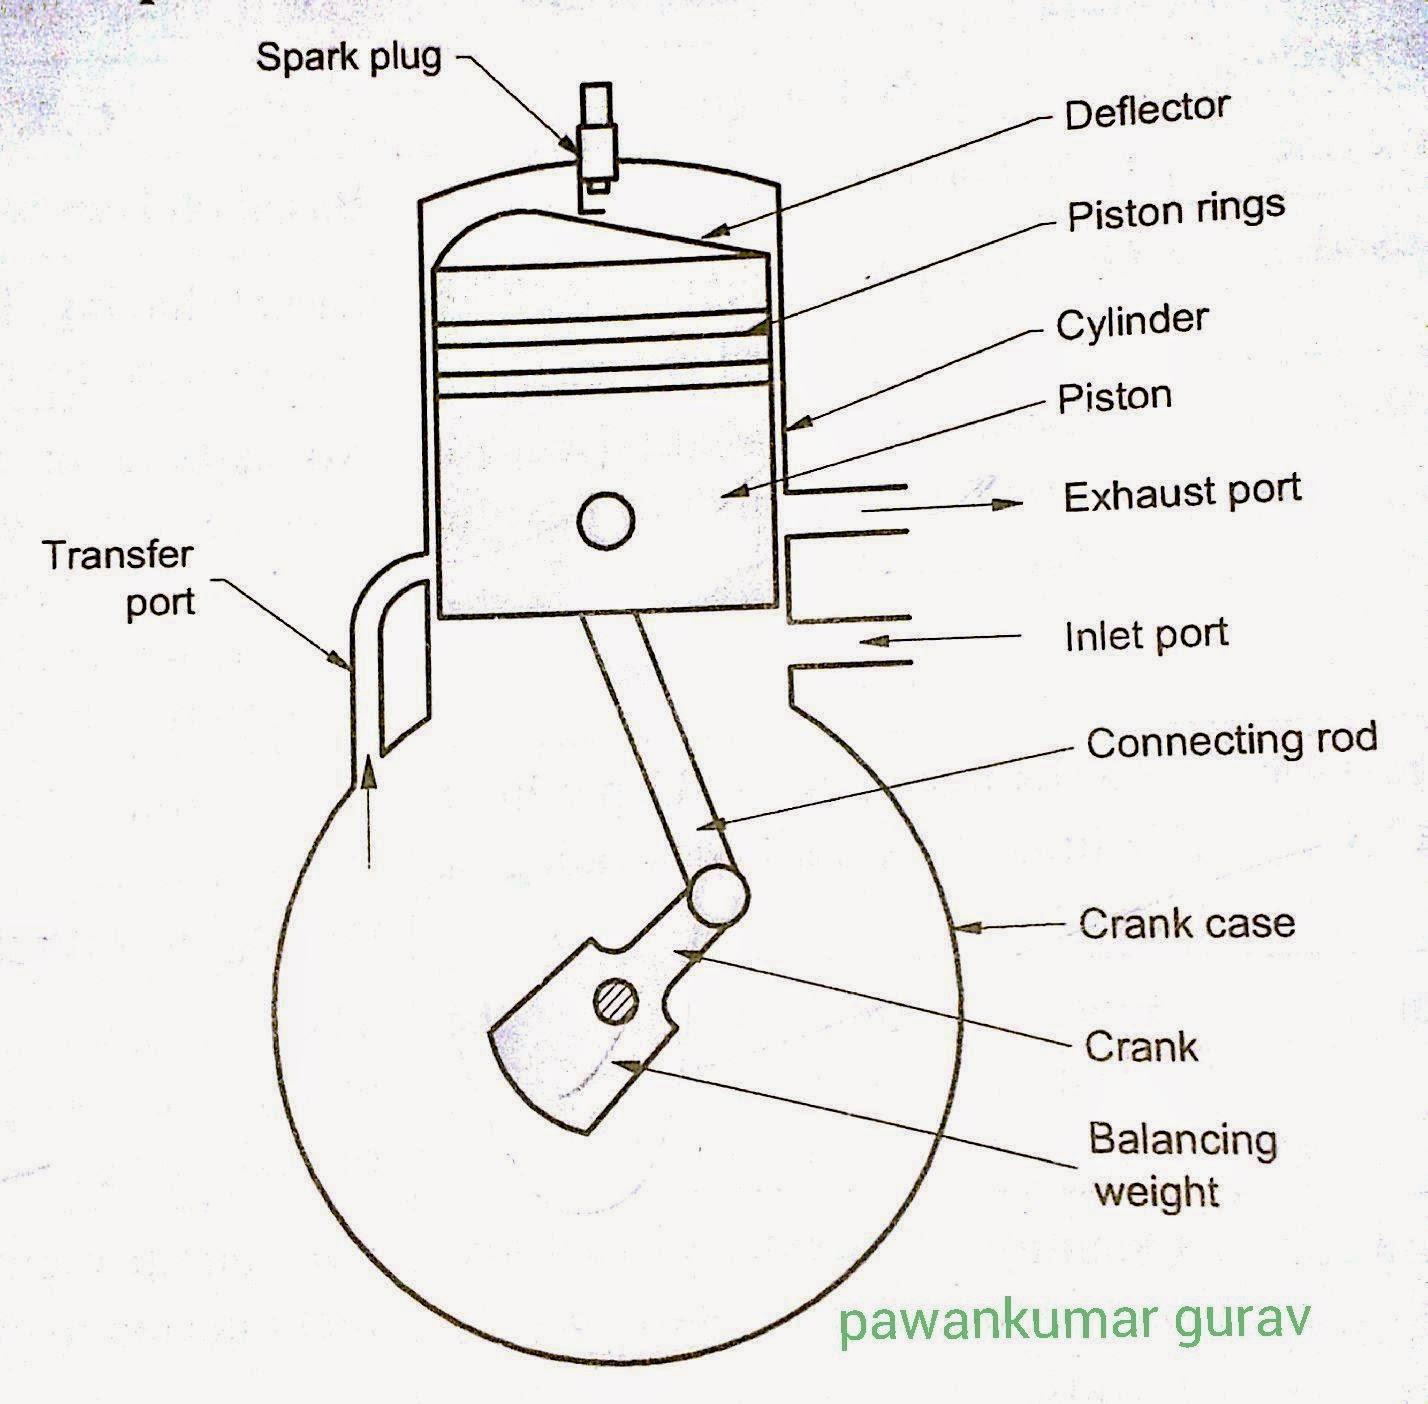 hight resolution of two stroke spark ignition engine diagram pawankumar gurav rh pawankumargurav com 2014 chevy spark engine diagram chevrolet spark engine diagram